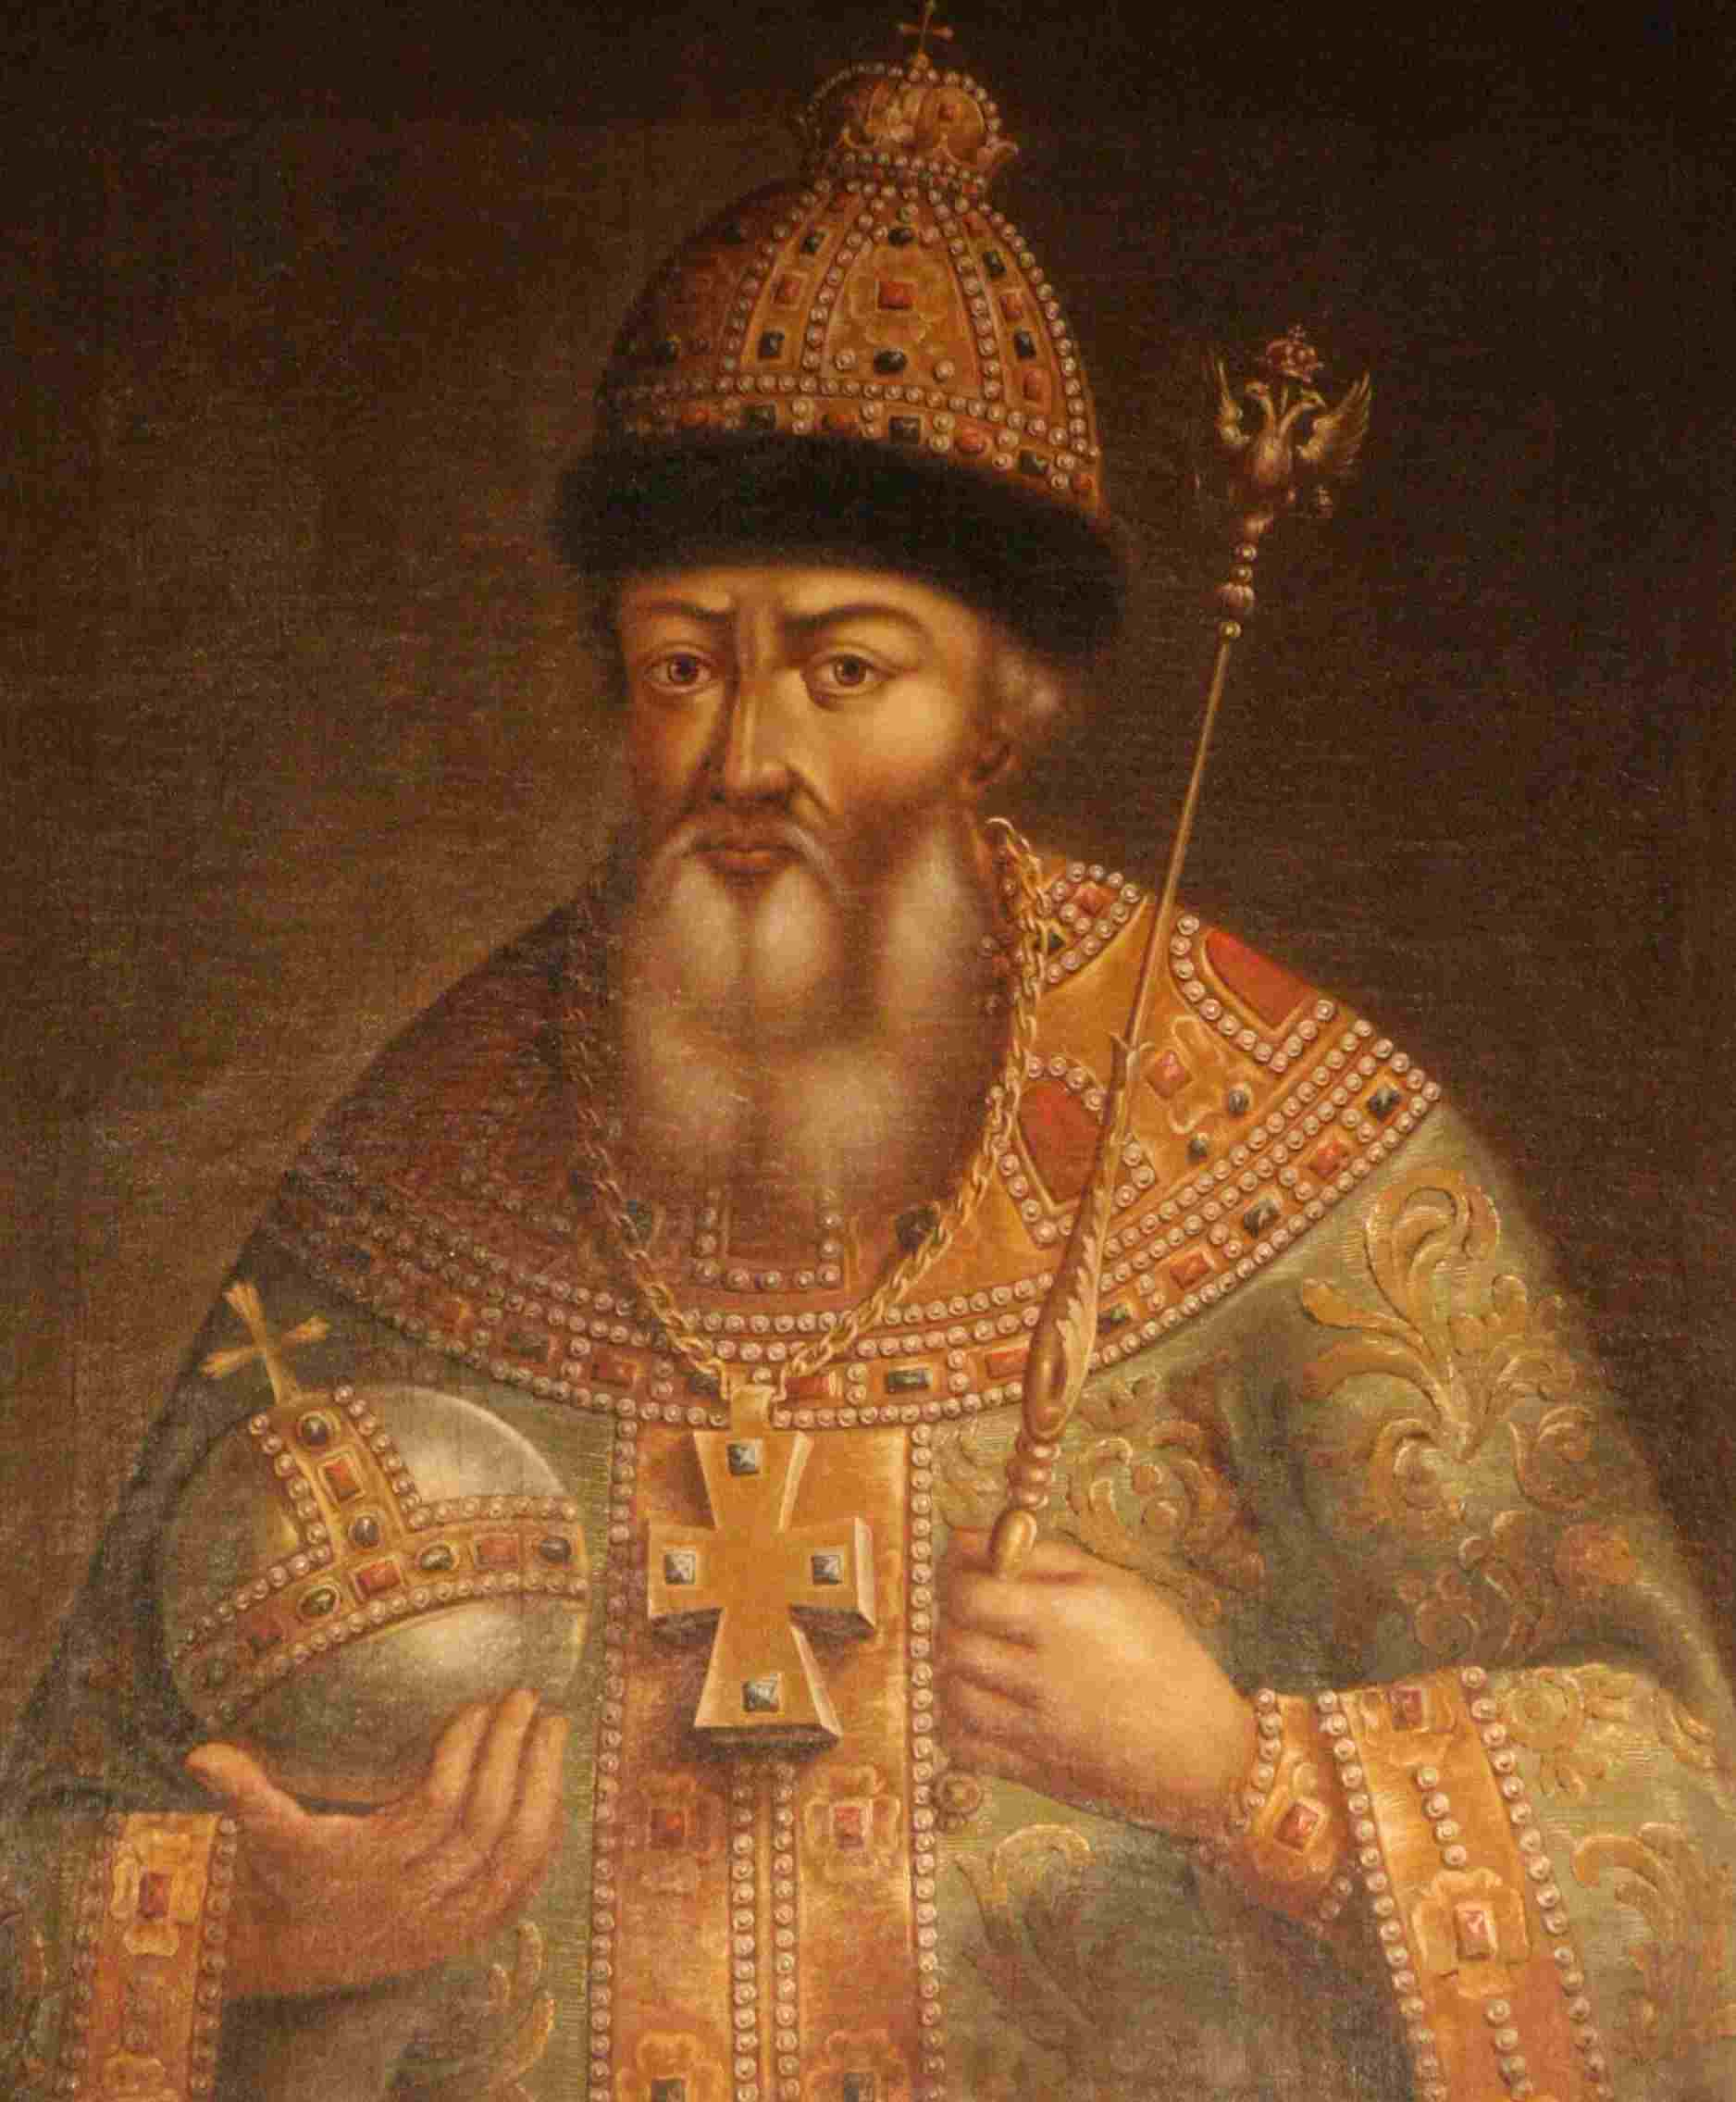 Василий Шуйский - лукавый царедворец